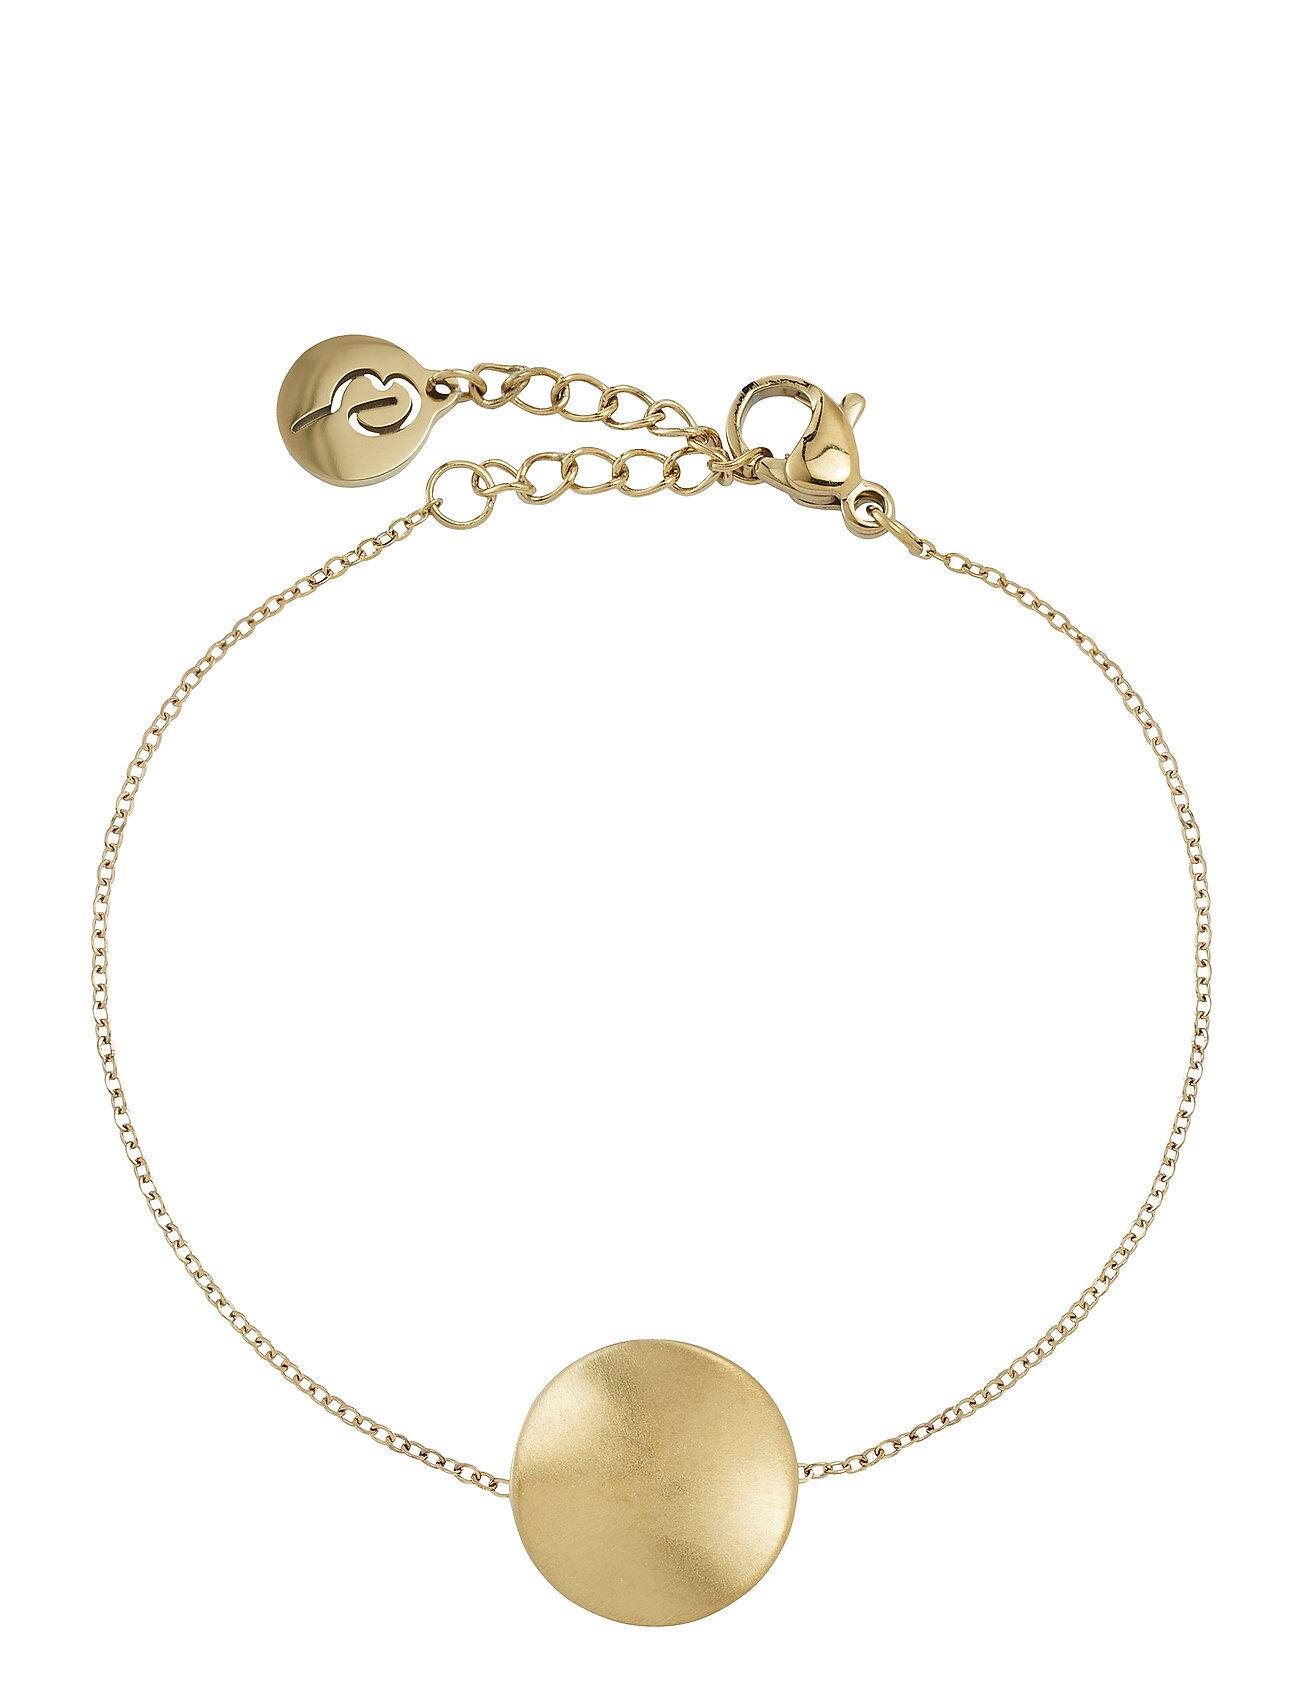 Edblad Elsa Bracelet Matt Accessories Jewellery Bracelets Chain Bracelets Kulta Edblad